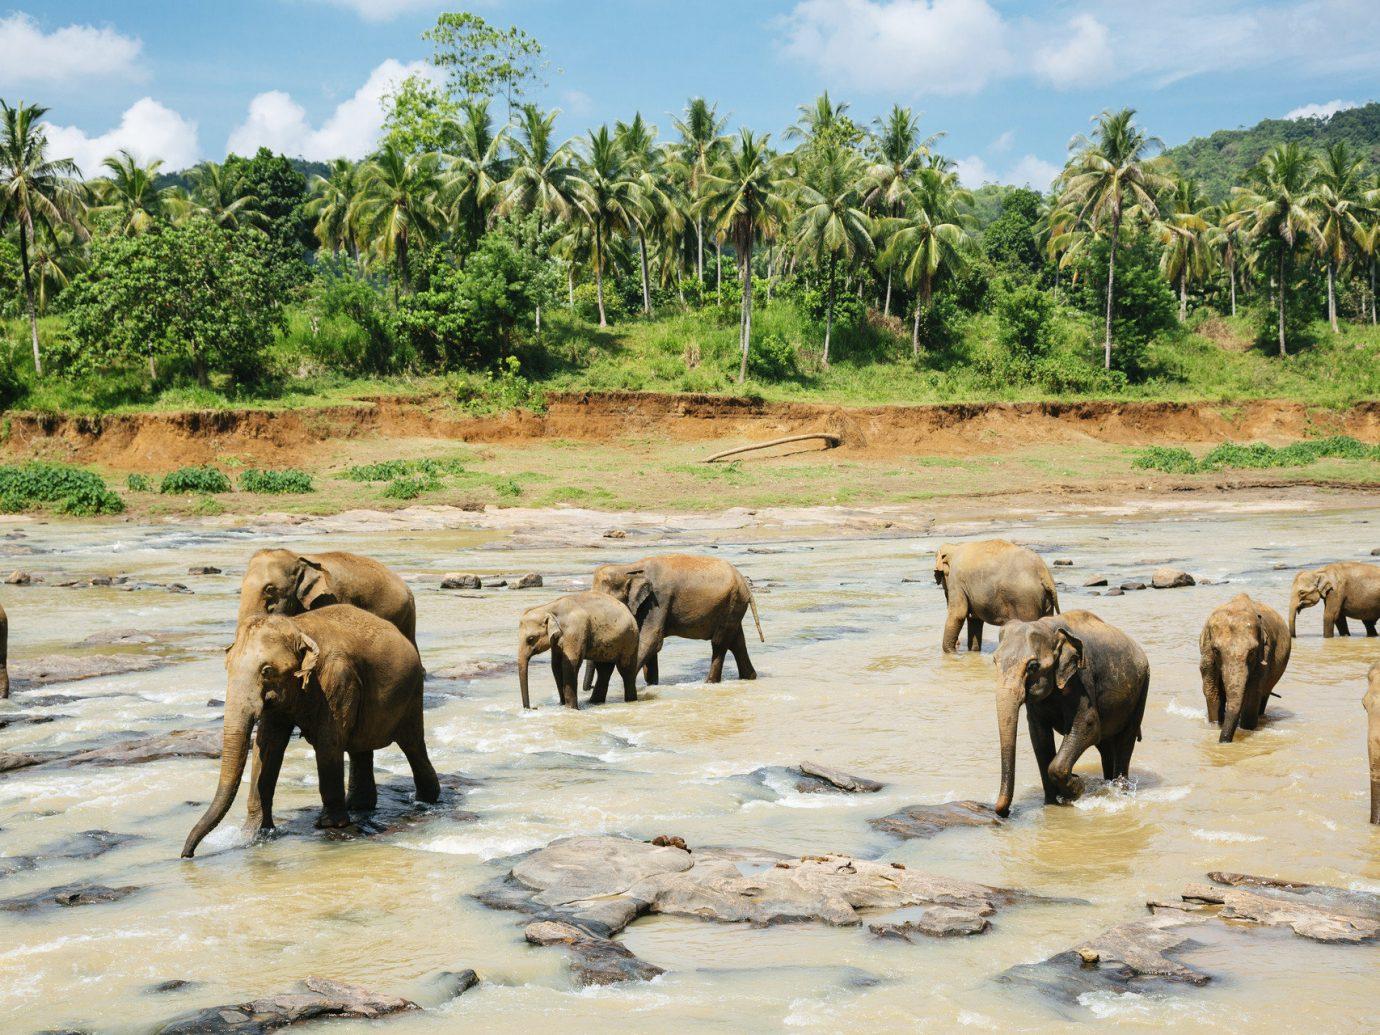 Budget Travel Tips Trip Ideas tree elephant outdoor sky herd indian elephant mammal group River animal Wildlife elephants and mammoths fauna walking savanna Safari Family african elephant Adventure plain gathered